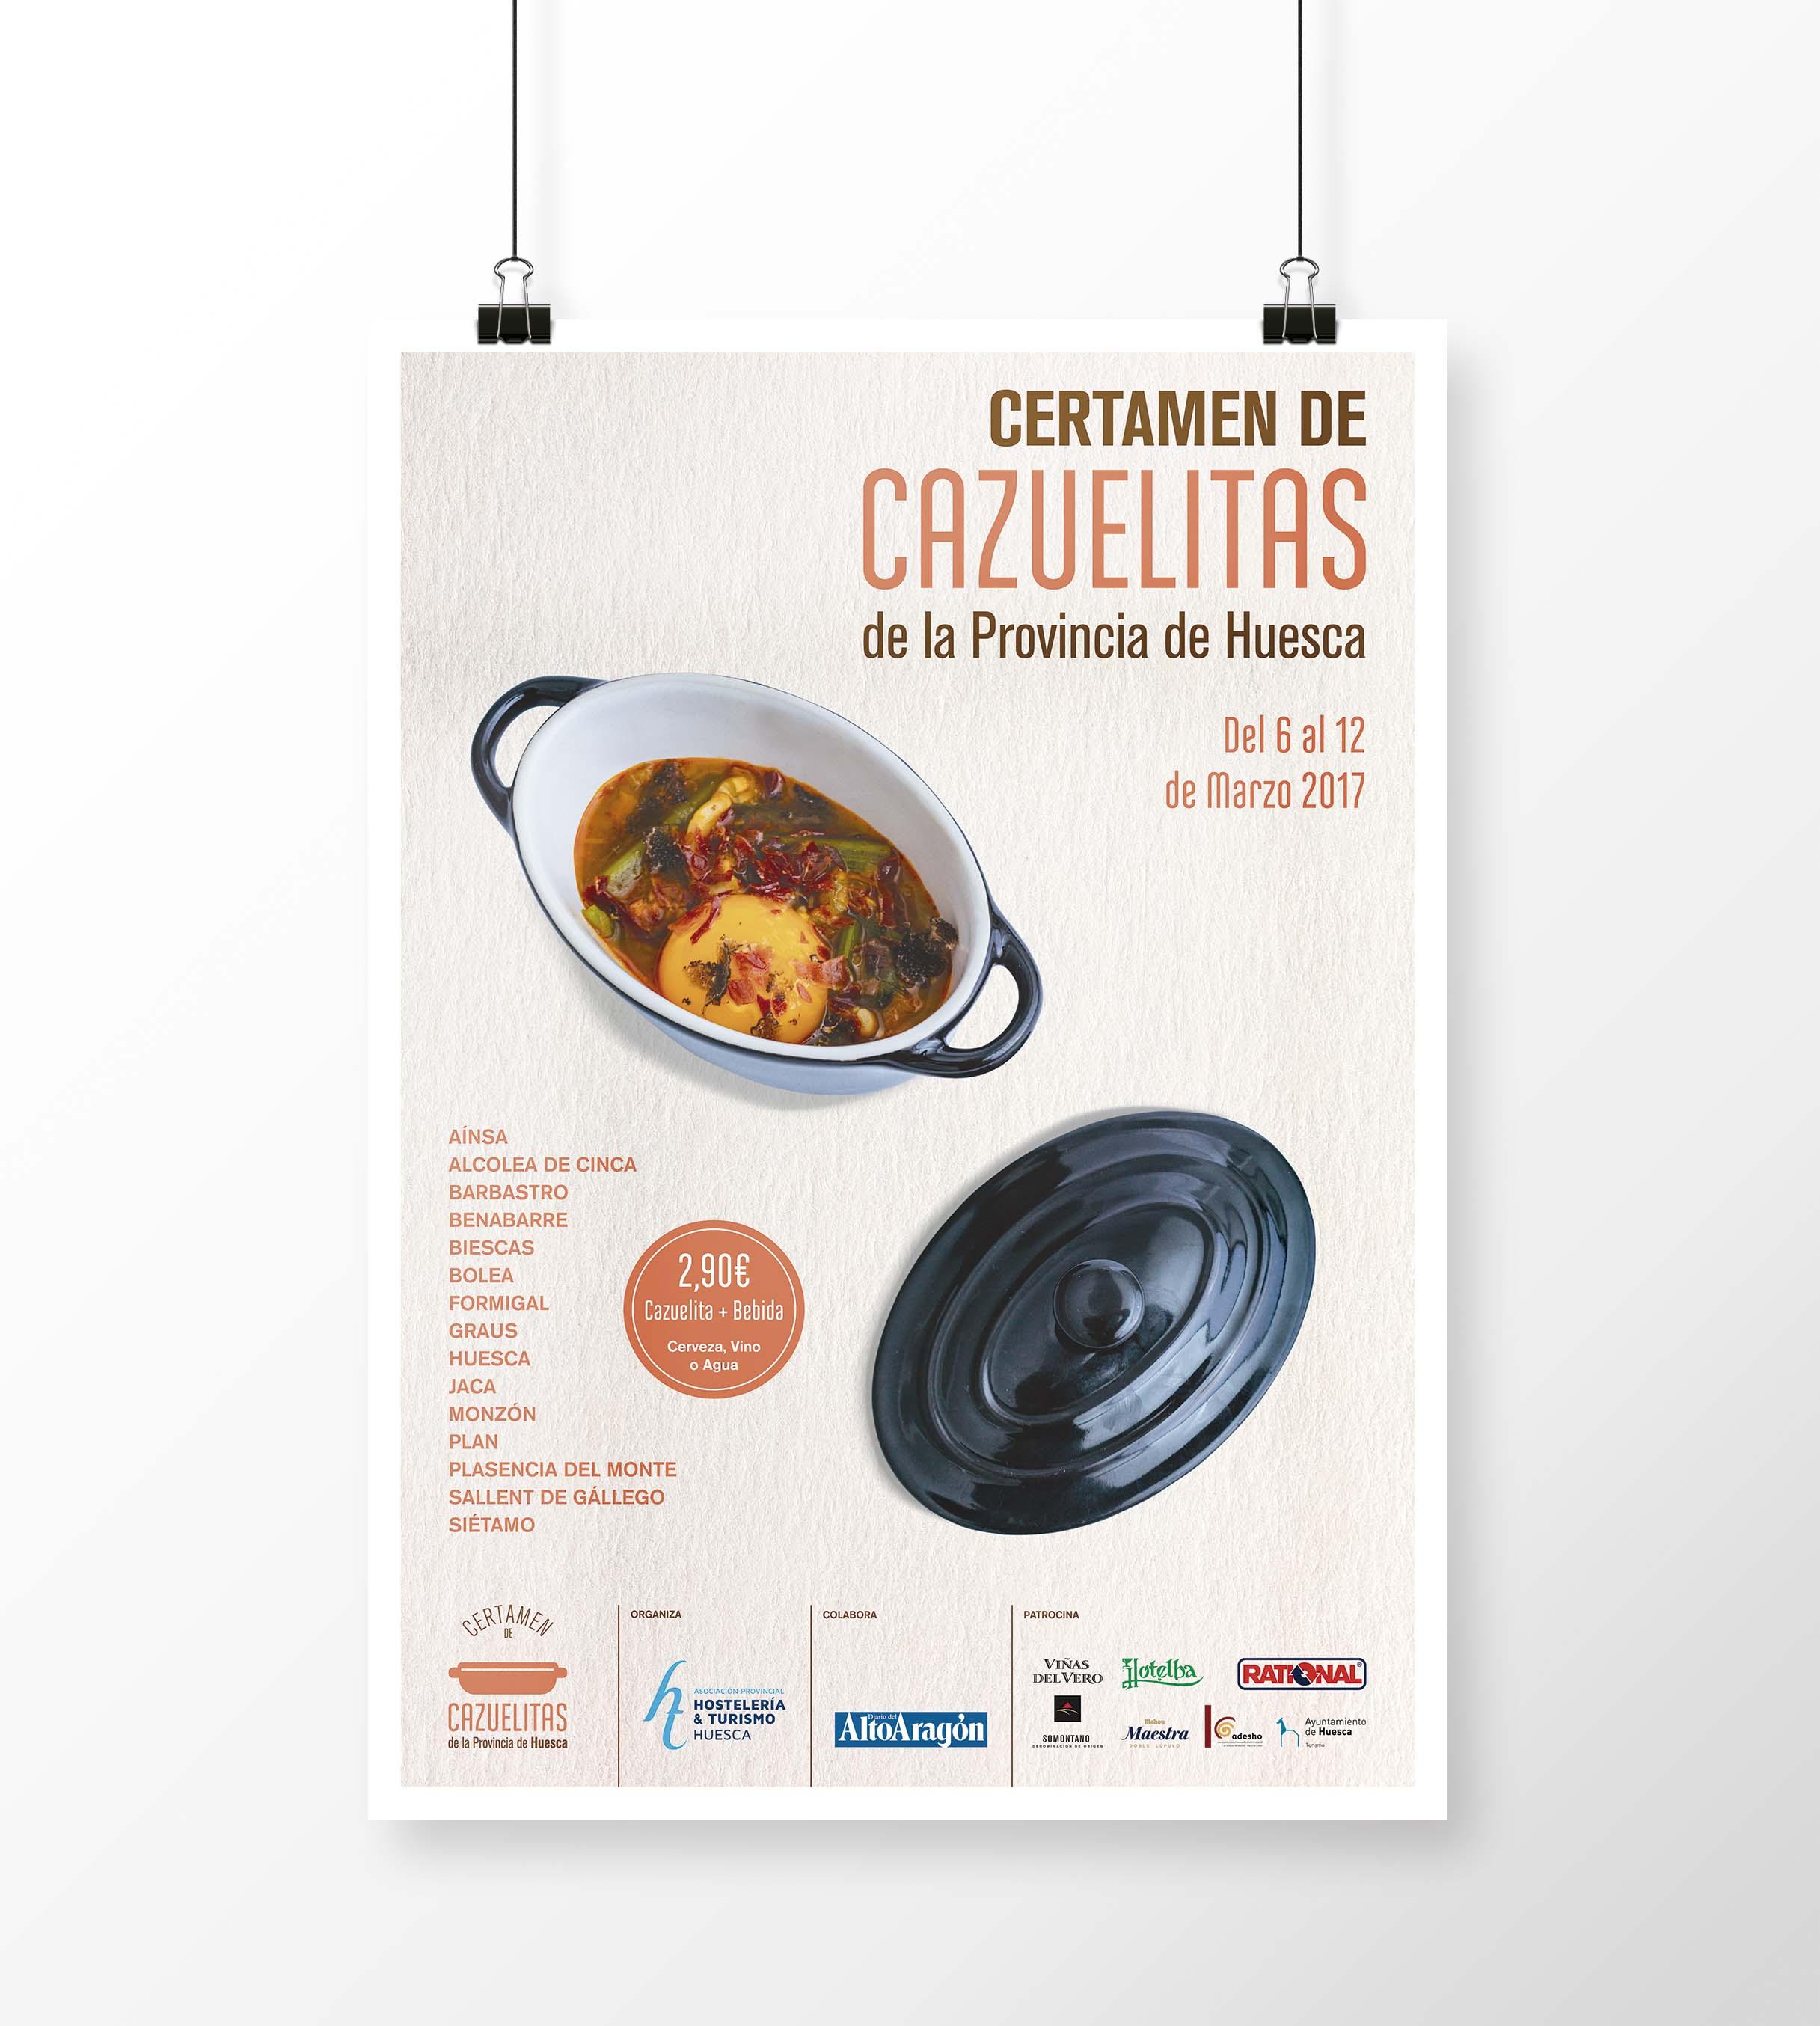 Cartel Certamen de Cazuelitas Provincia de Huesca 2017